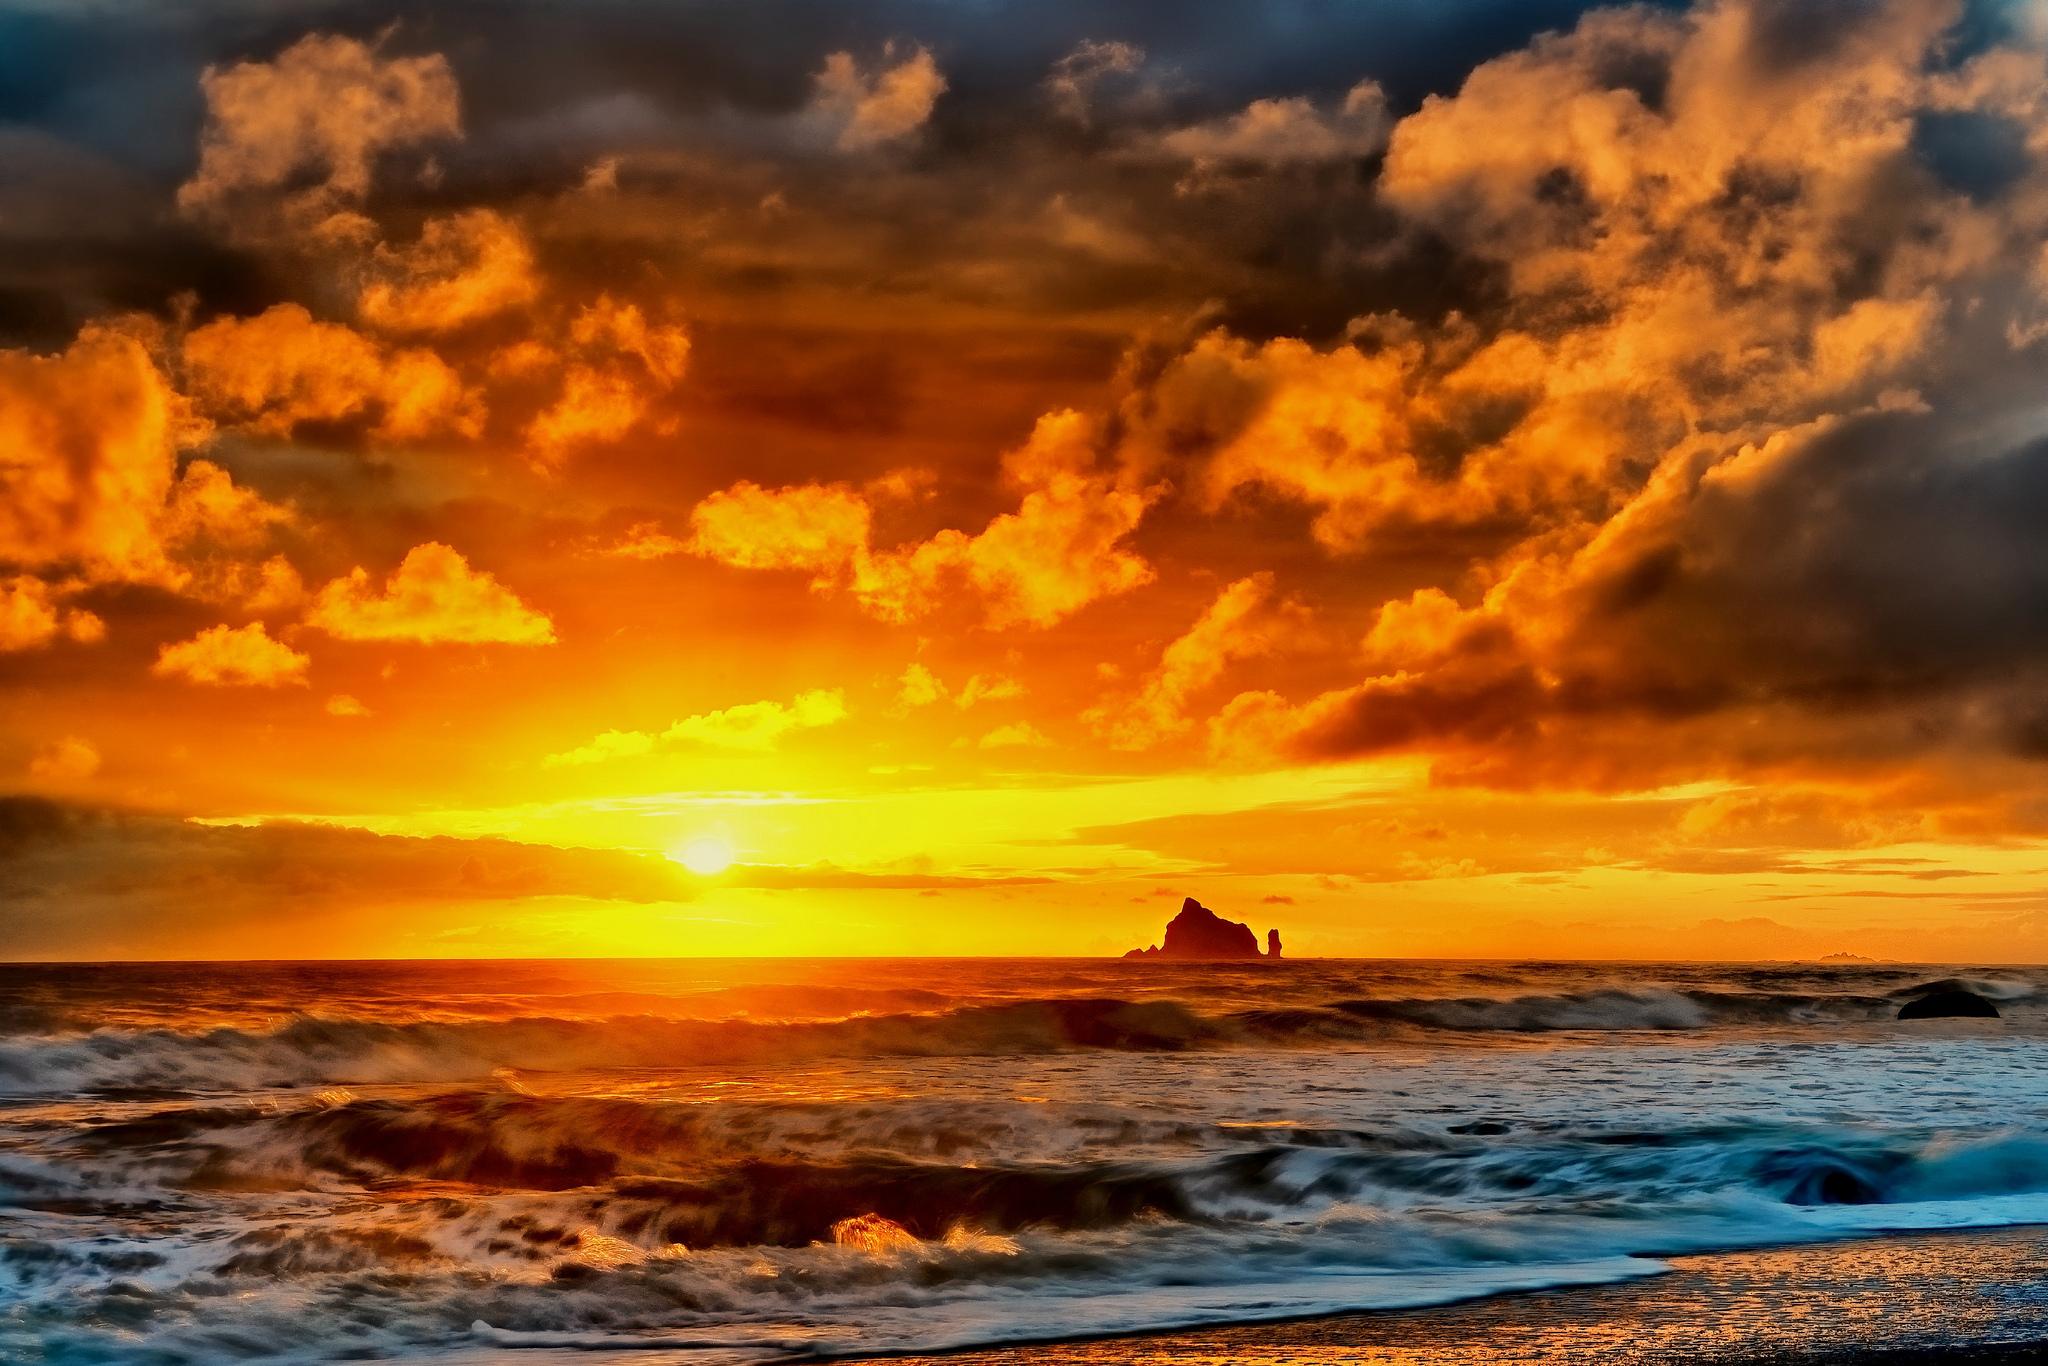 Sunset Hd Wallpaper Background Image 2048x1366 Id 517455